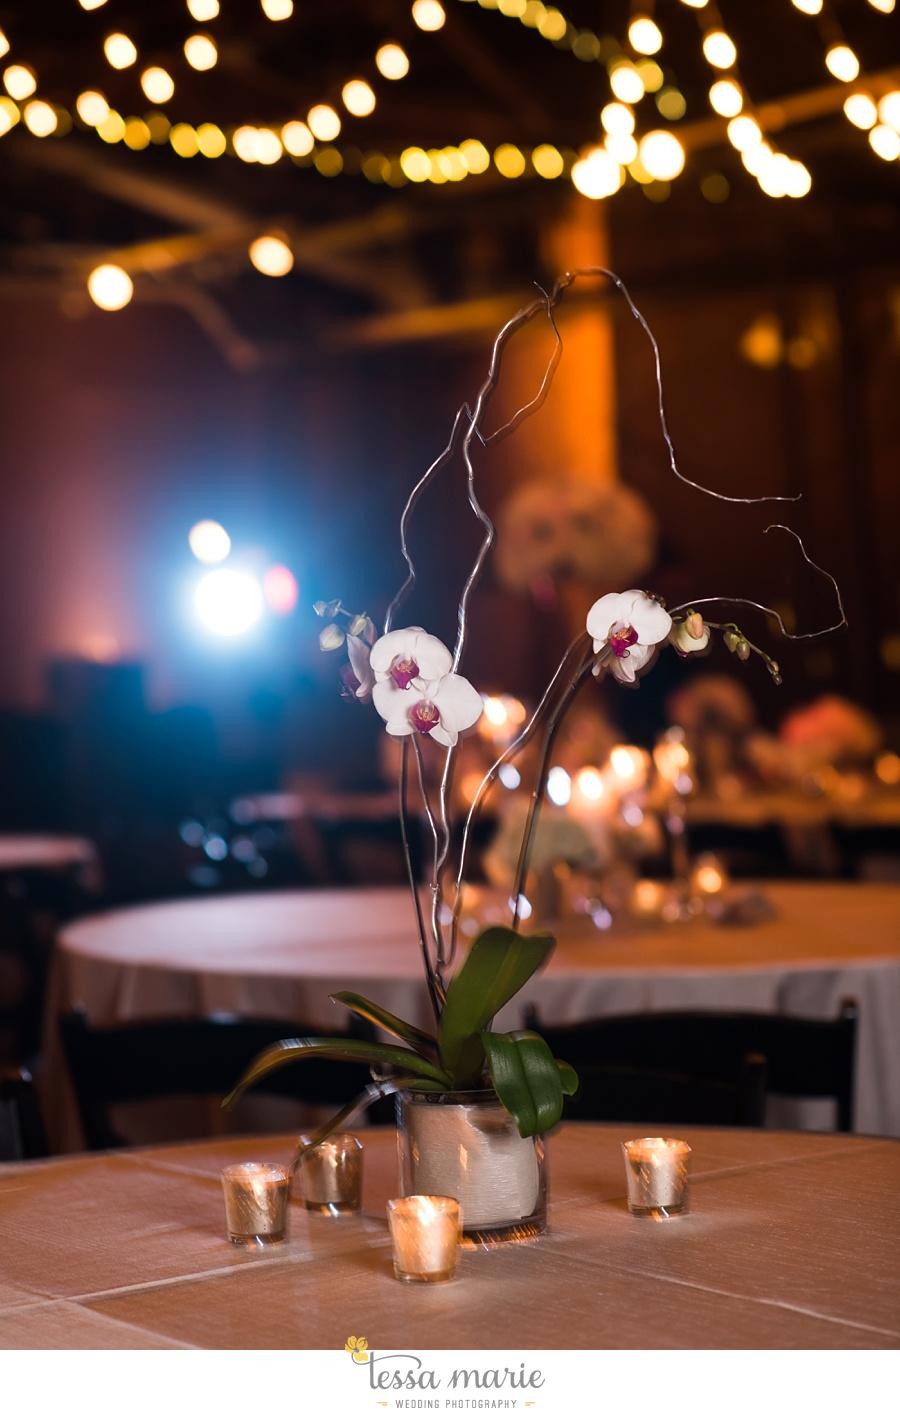 315_tessa_marie_weddings_emotional_moments_photography_king_low_wedding_sam_neil_best_atlanta_wedding_photographer